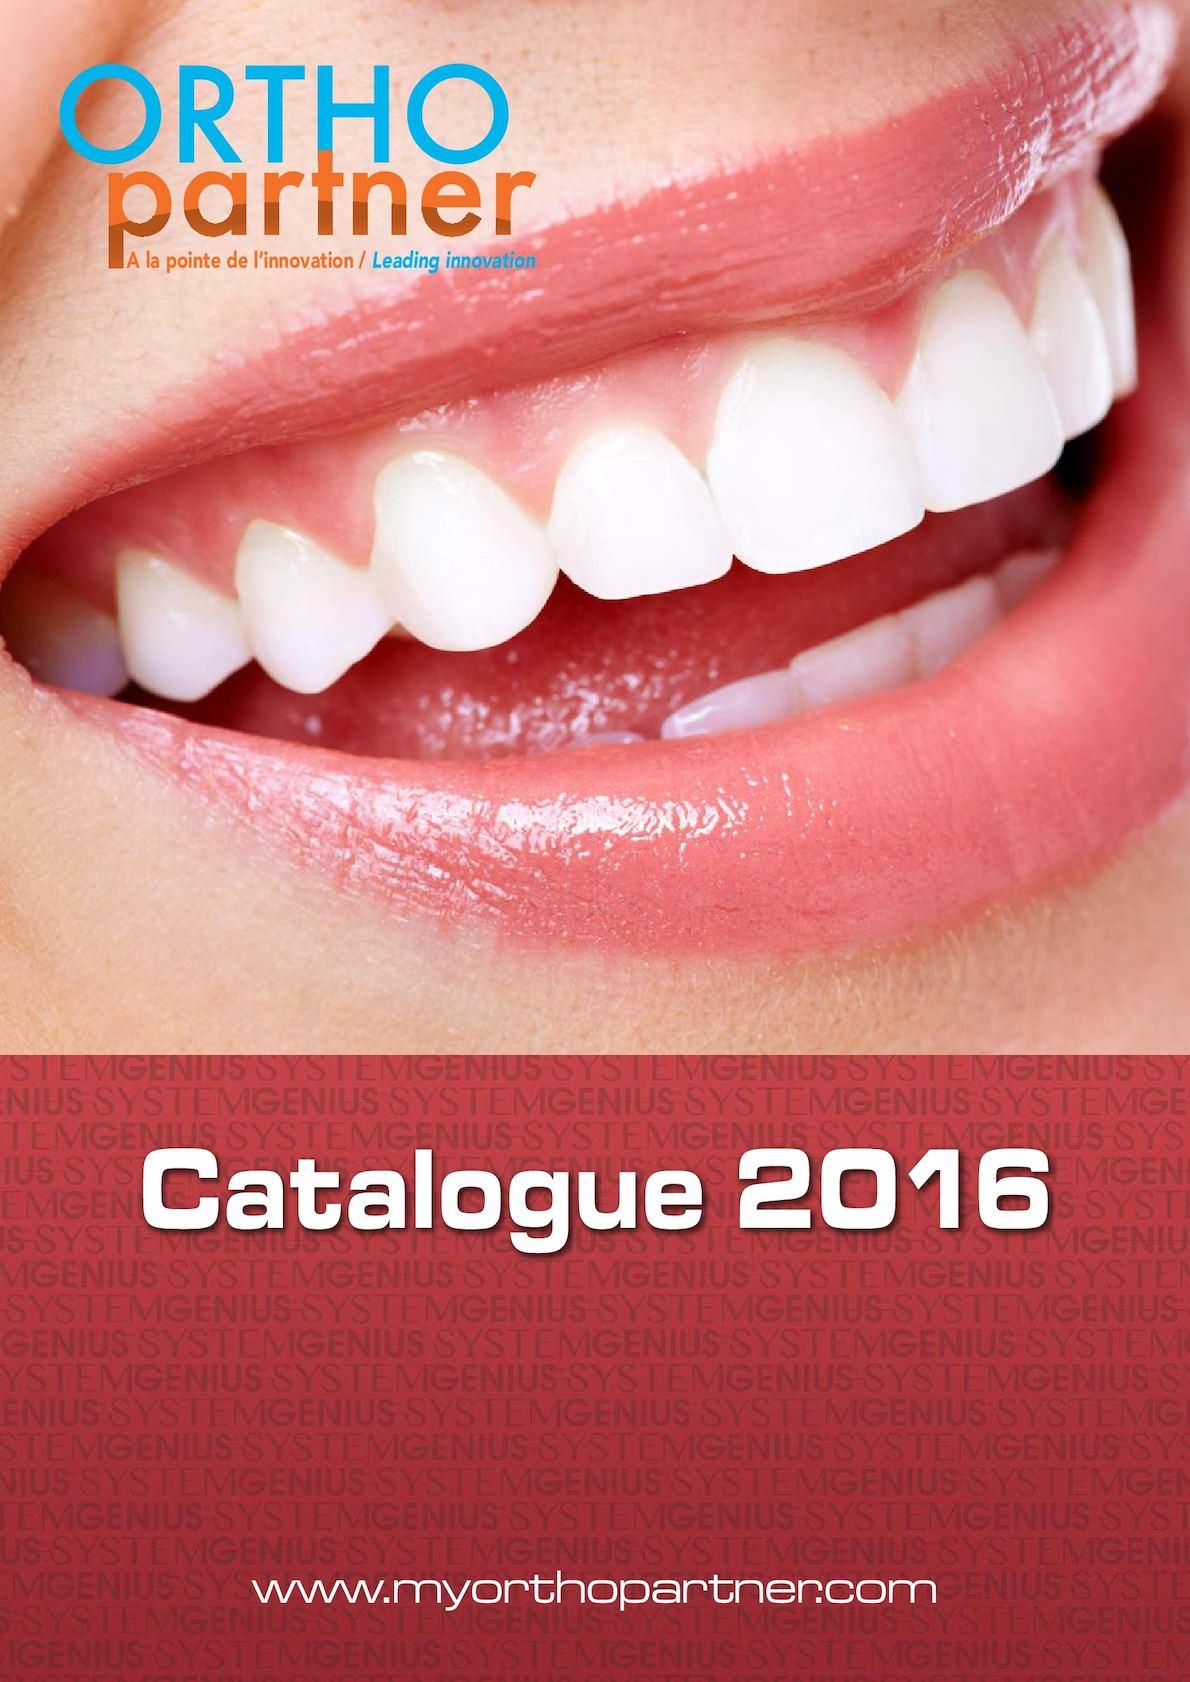 5 - Catalogue Ortho Partner 2016